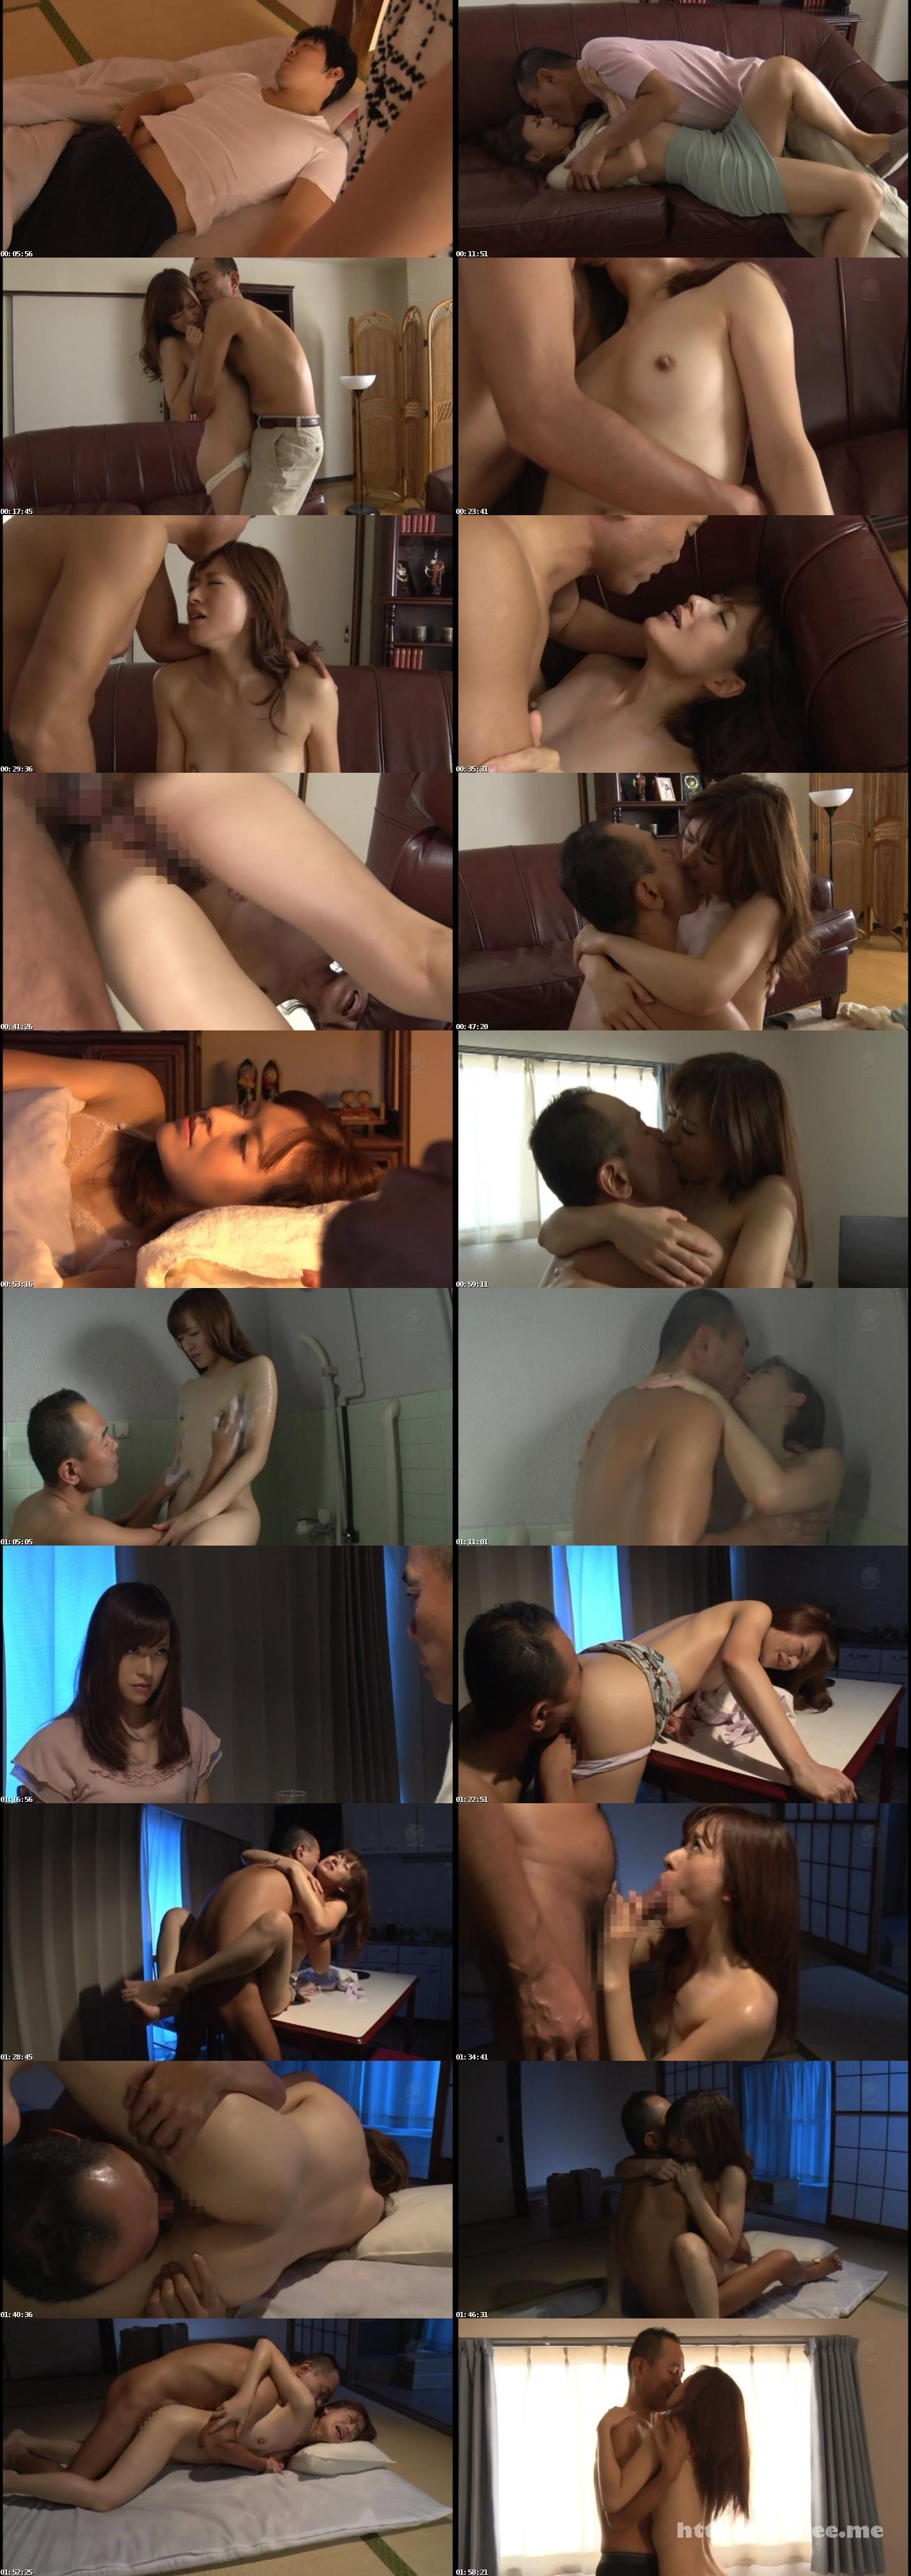 [JUY-043] 密着セックス マンション管理人と人妻の不貞関係 徳島えり